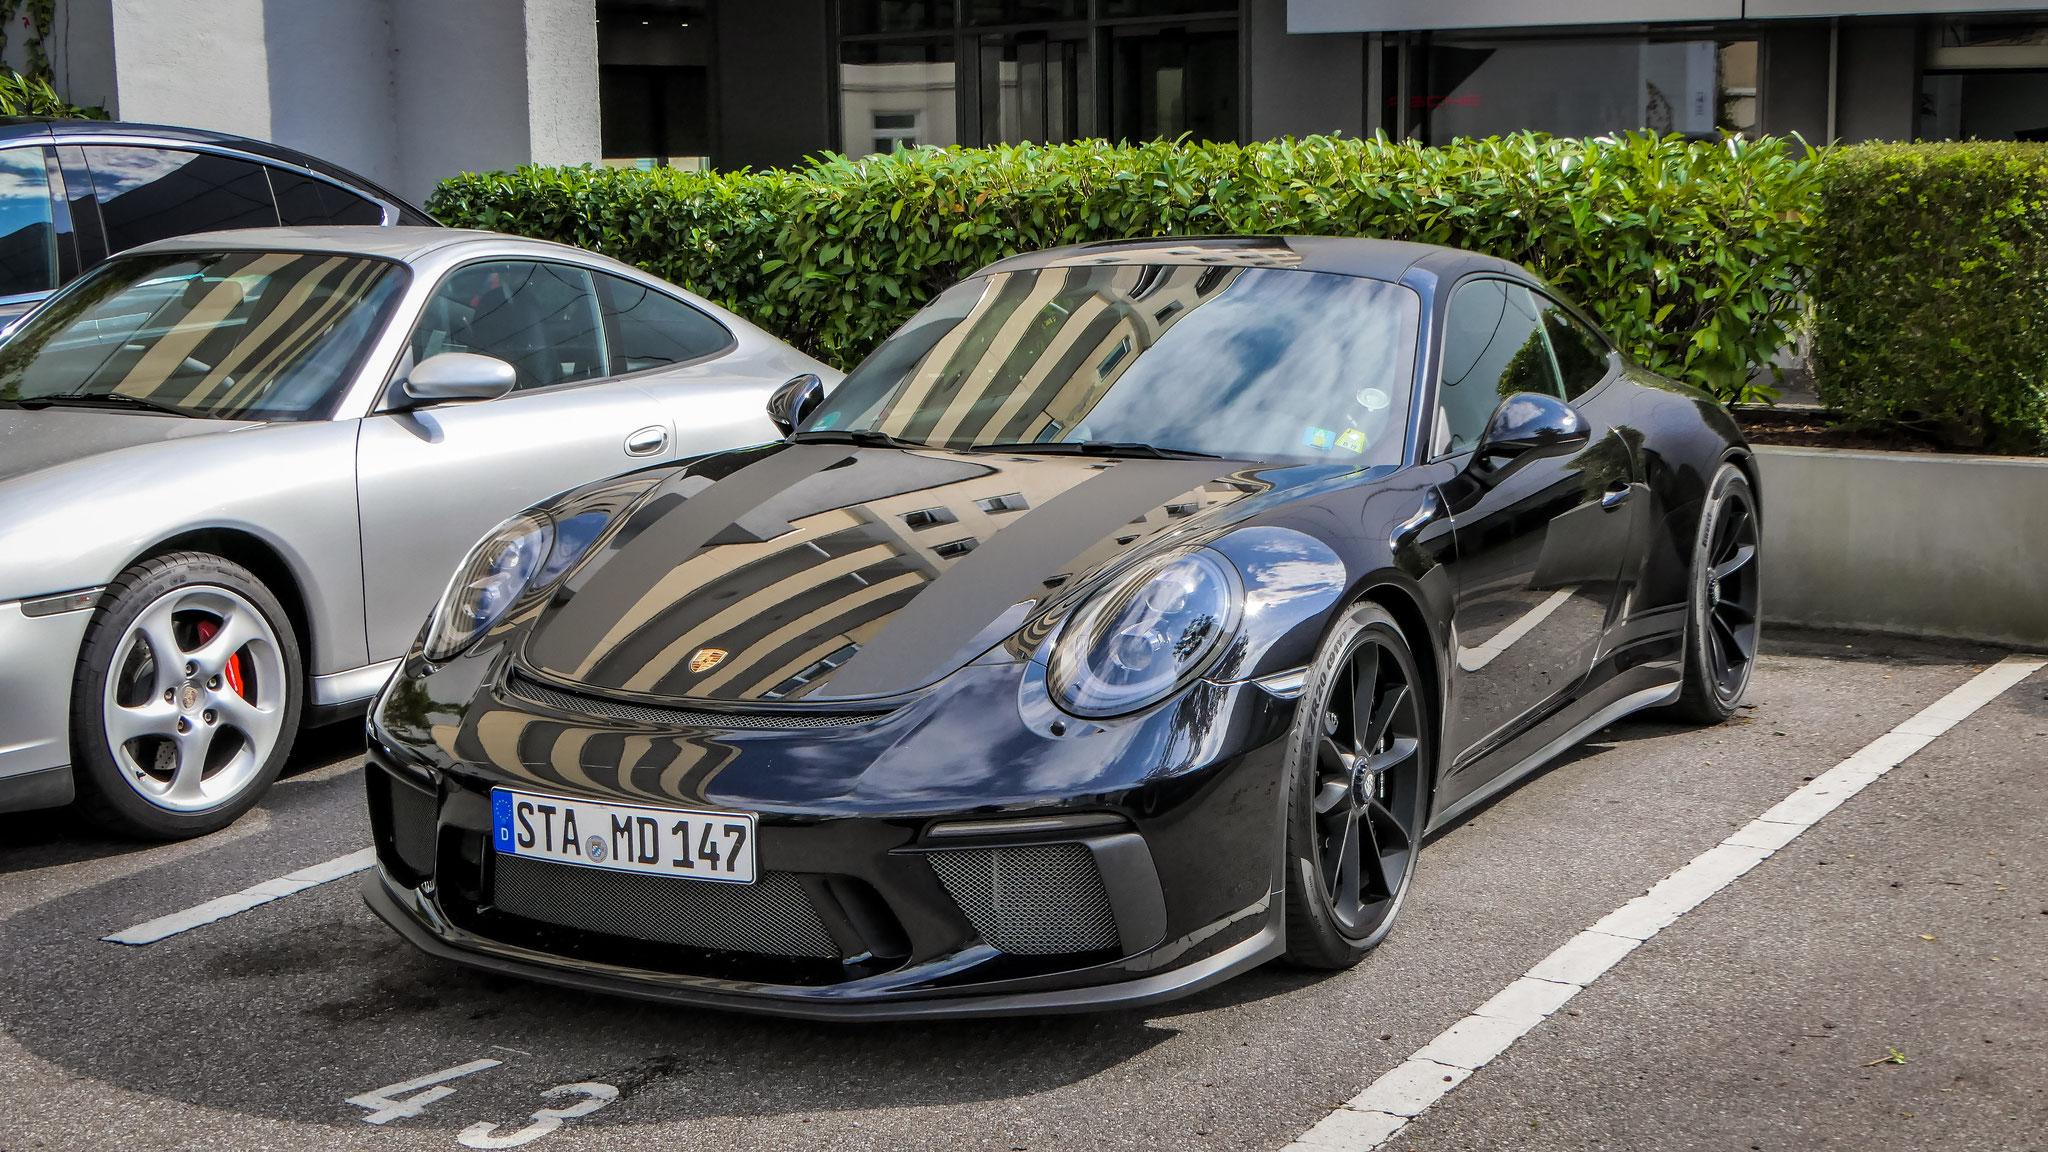 Porsche 991 GT3 Touring Package - BAD-FF-8